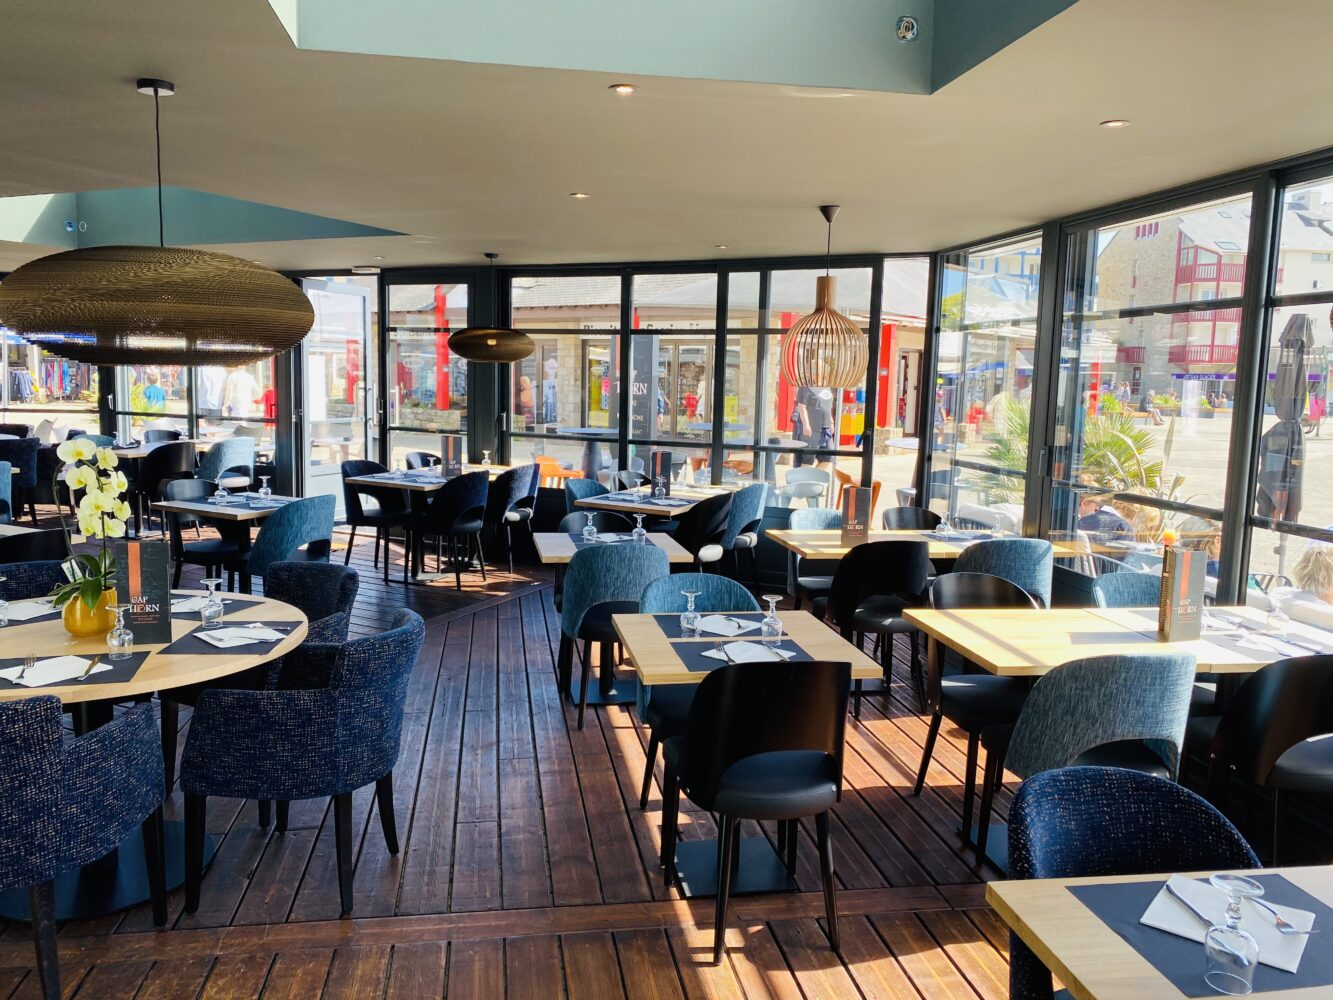 Restaurant-Le-Cap-Horn-interieur-restaurant-1